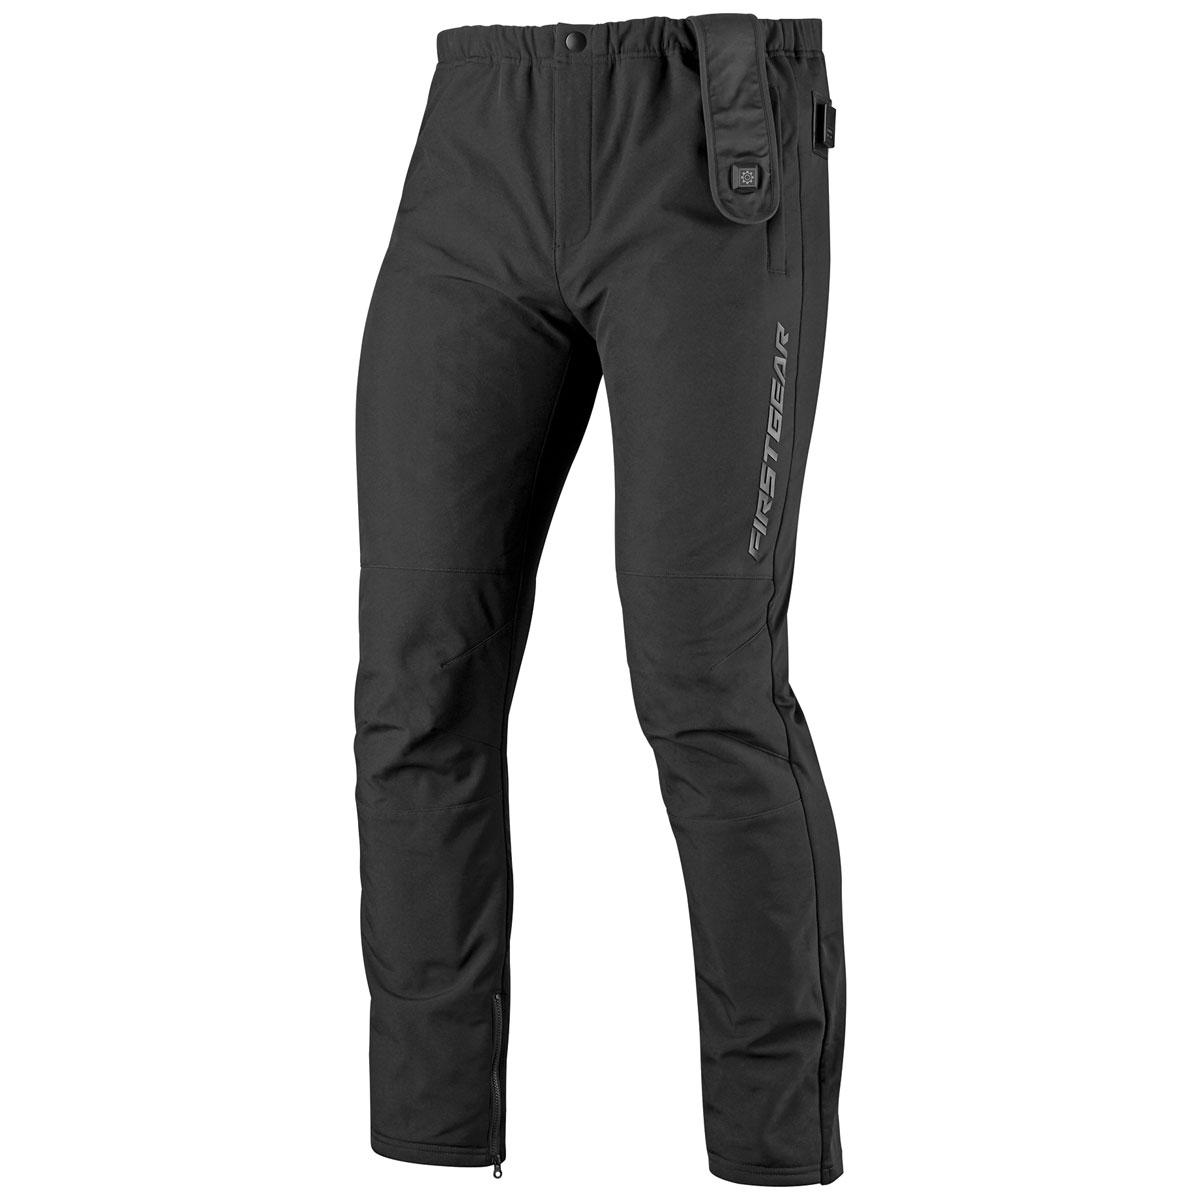 Firstgear Men's 12v Heated Pant Liner